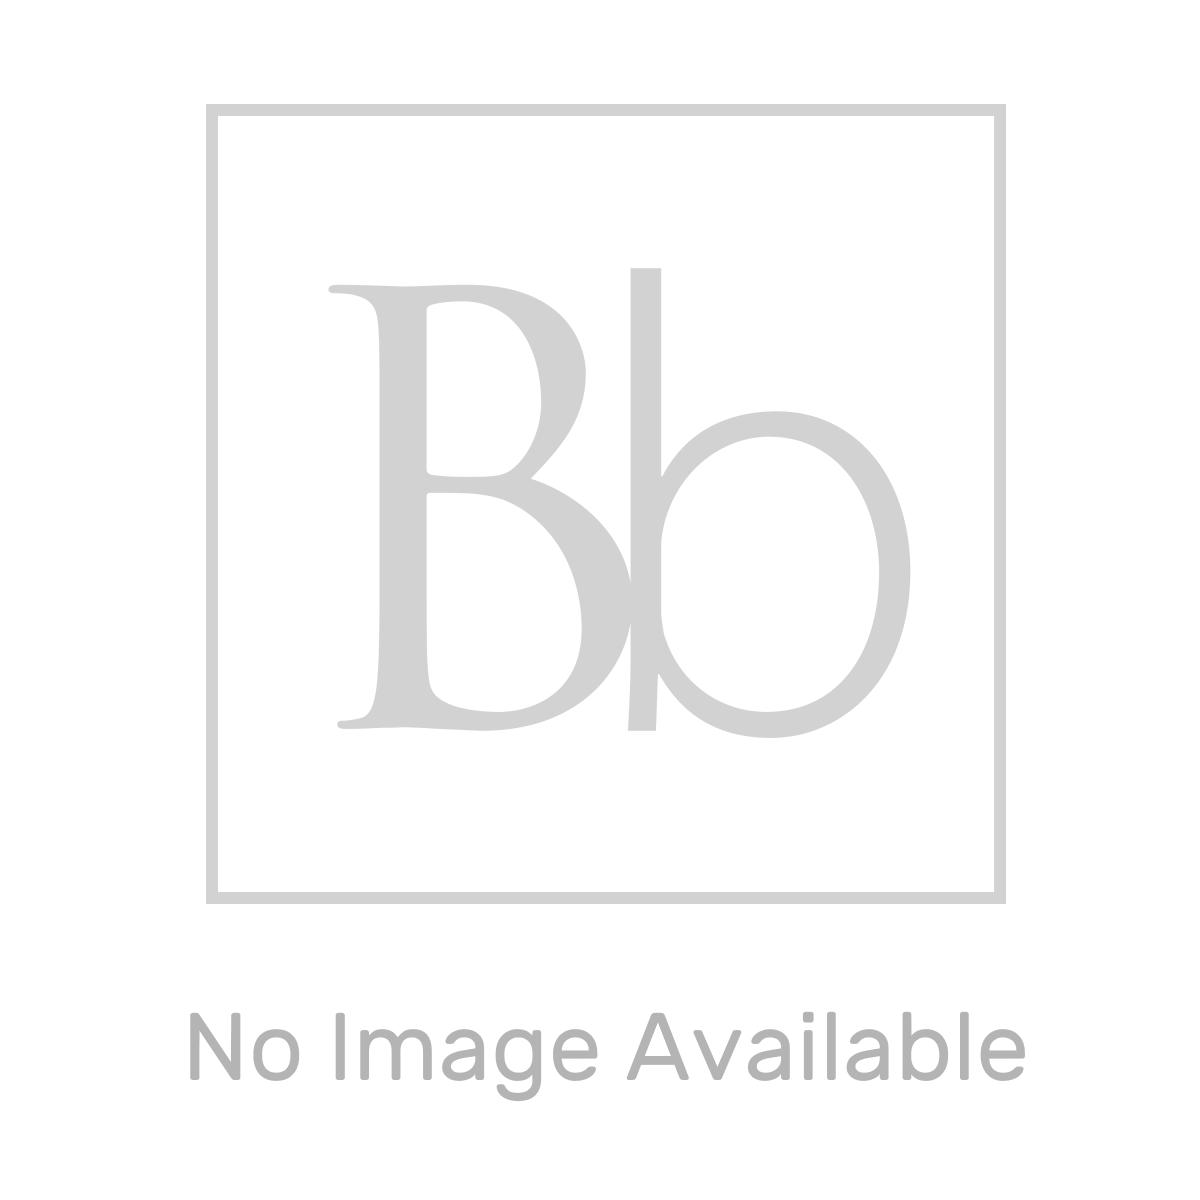 Frontline Trac Bath Shower Mixer Tap